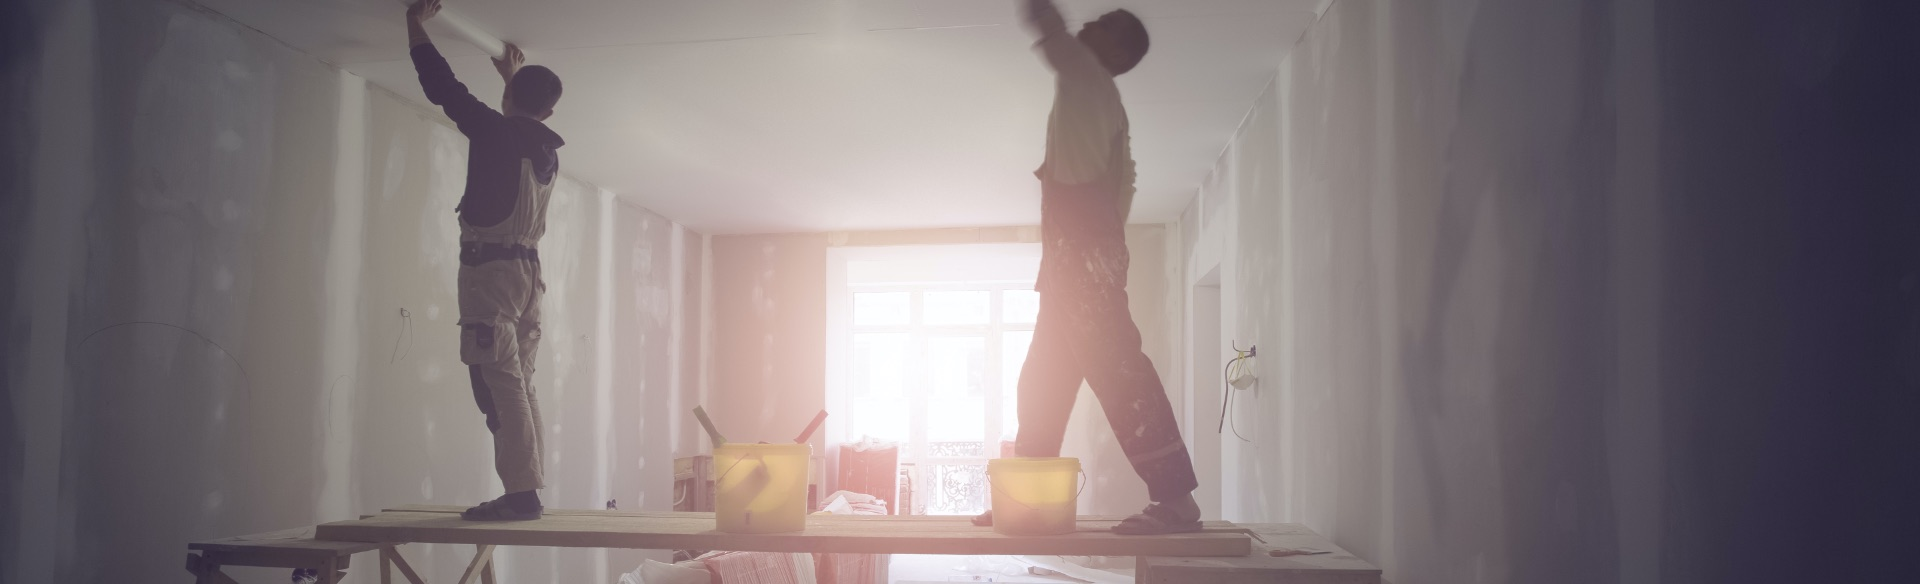 maintenance repairs and upgrades